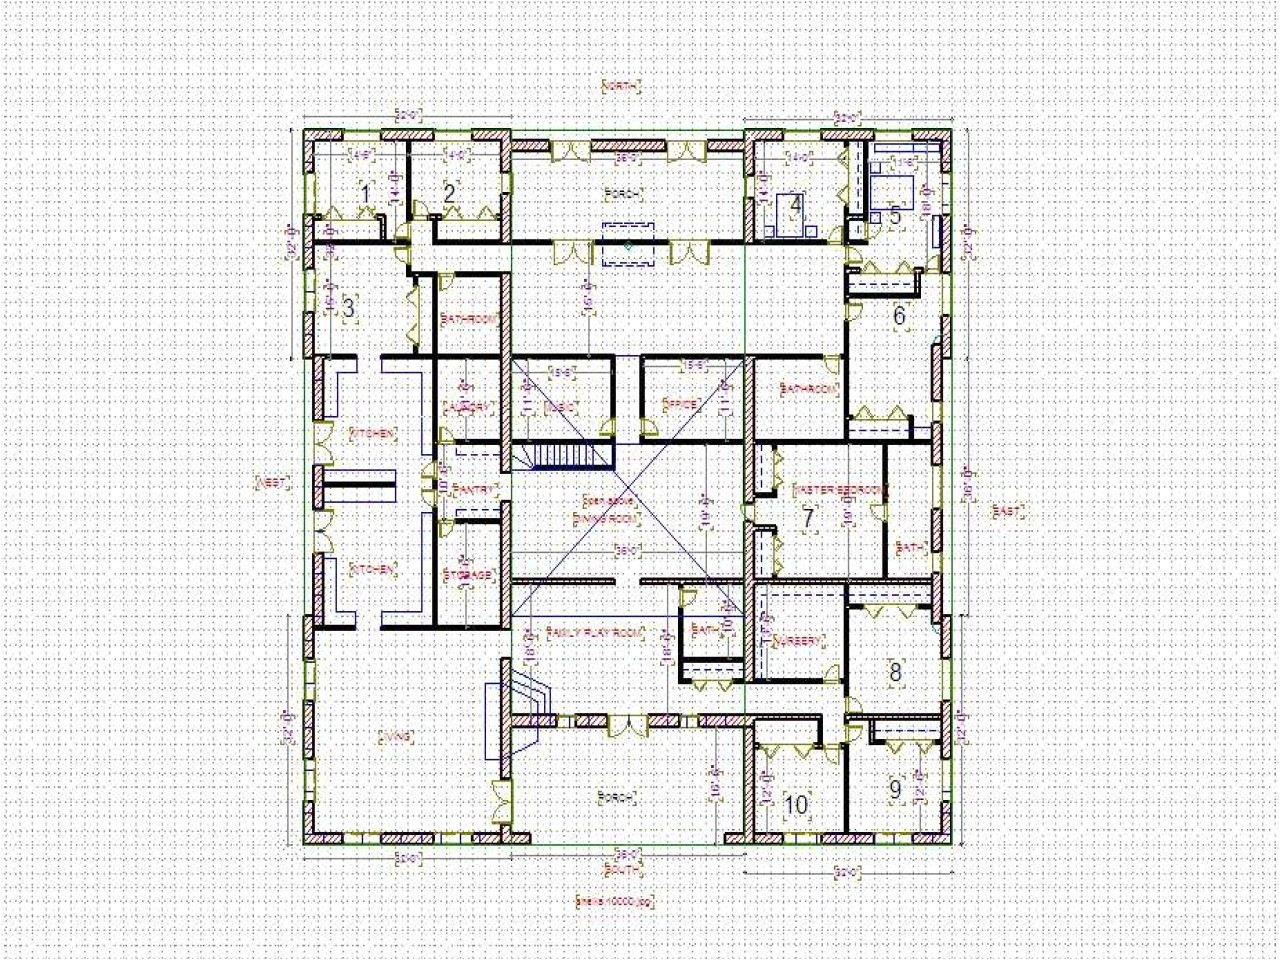 8000 Square Foot House Plans 10000 Square Foot House Plans 8000 Square Foot House